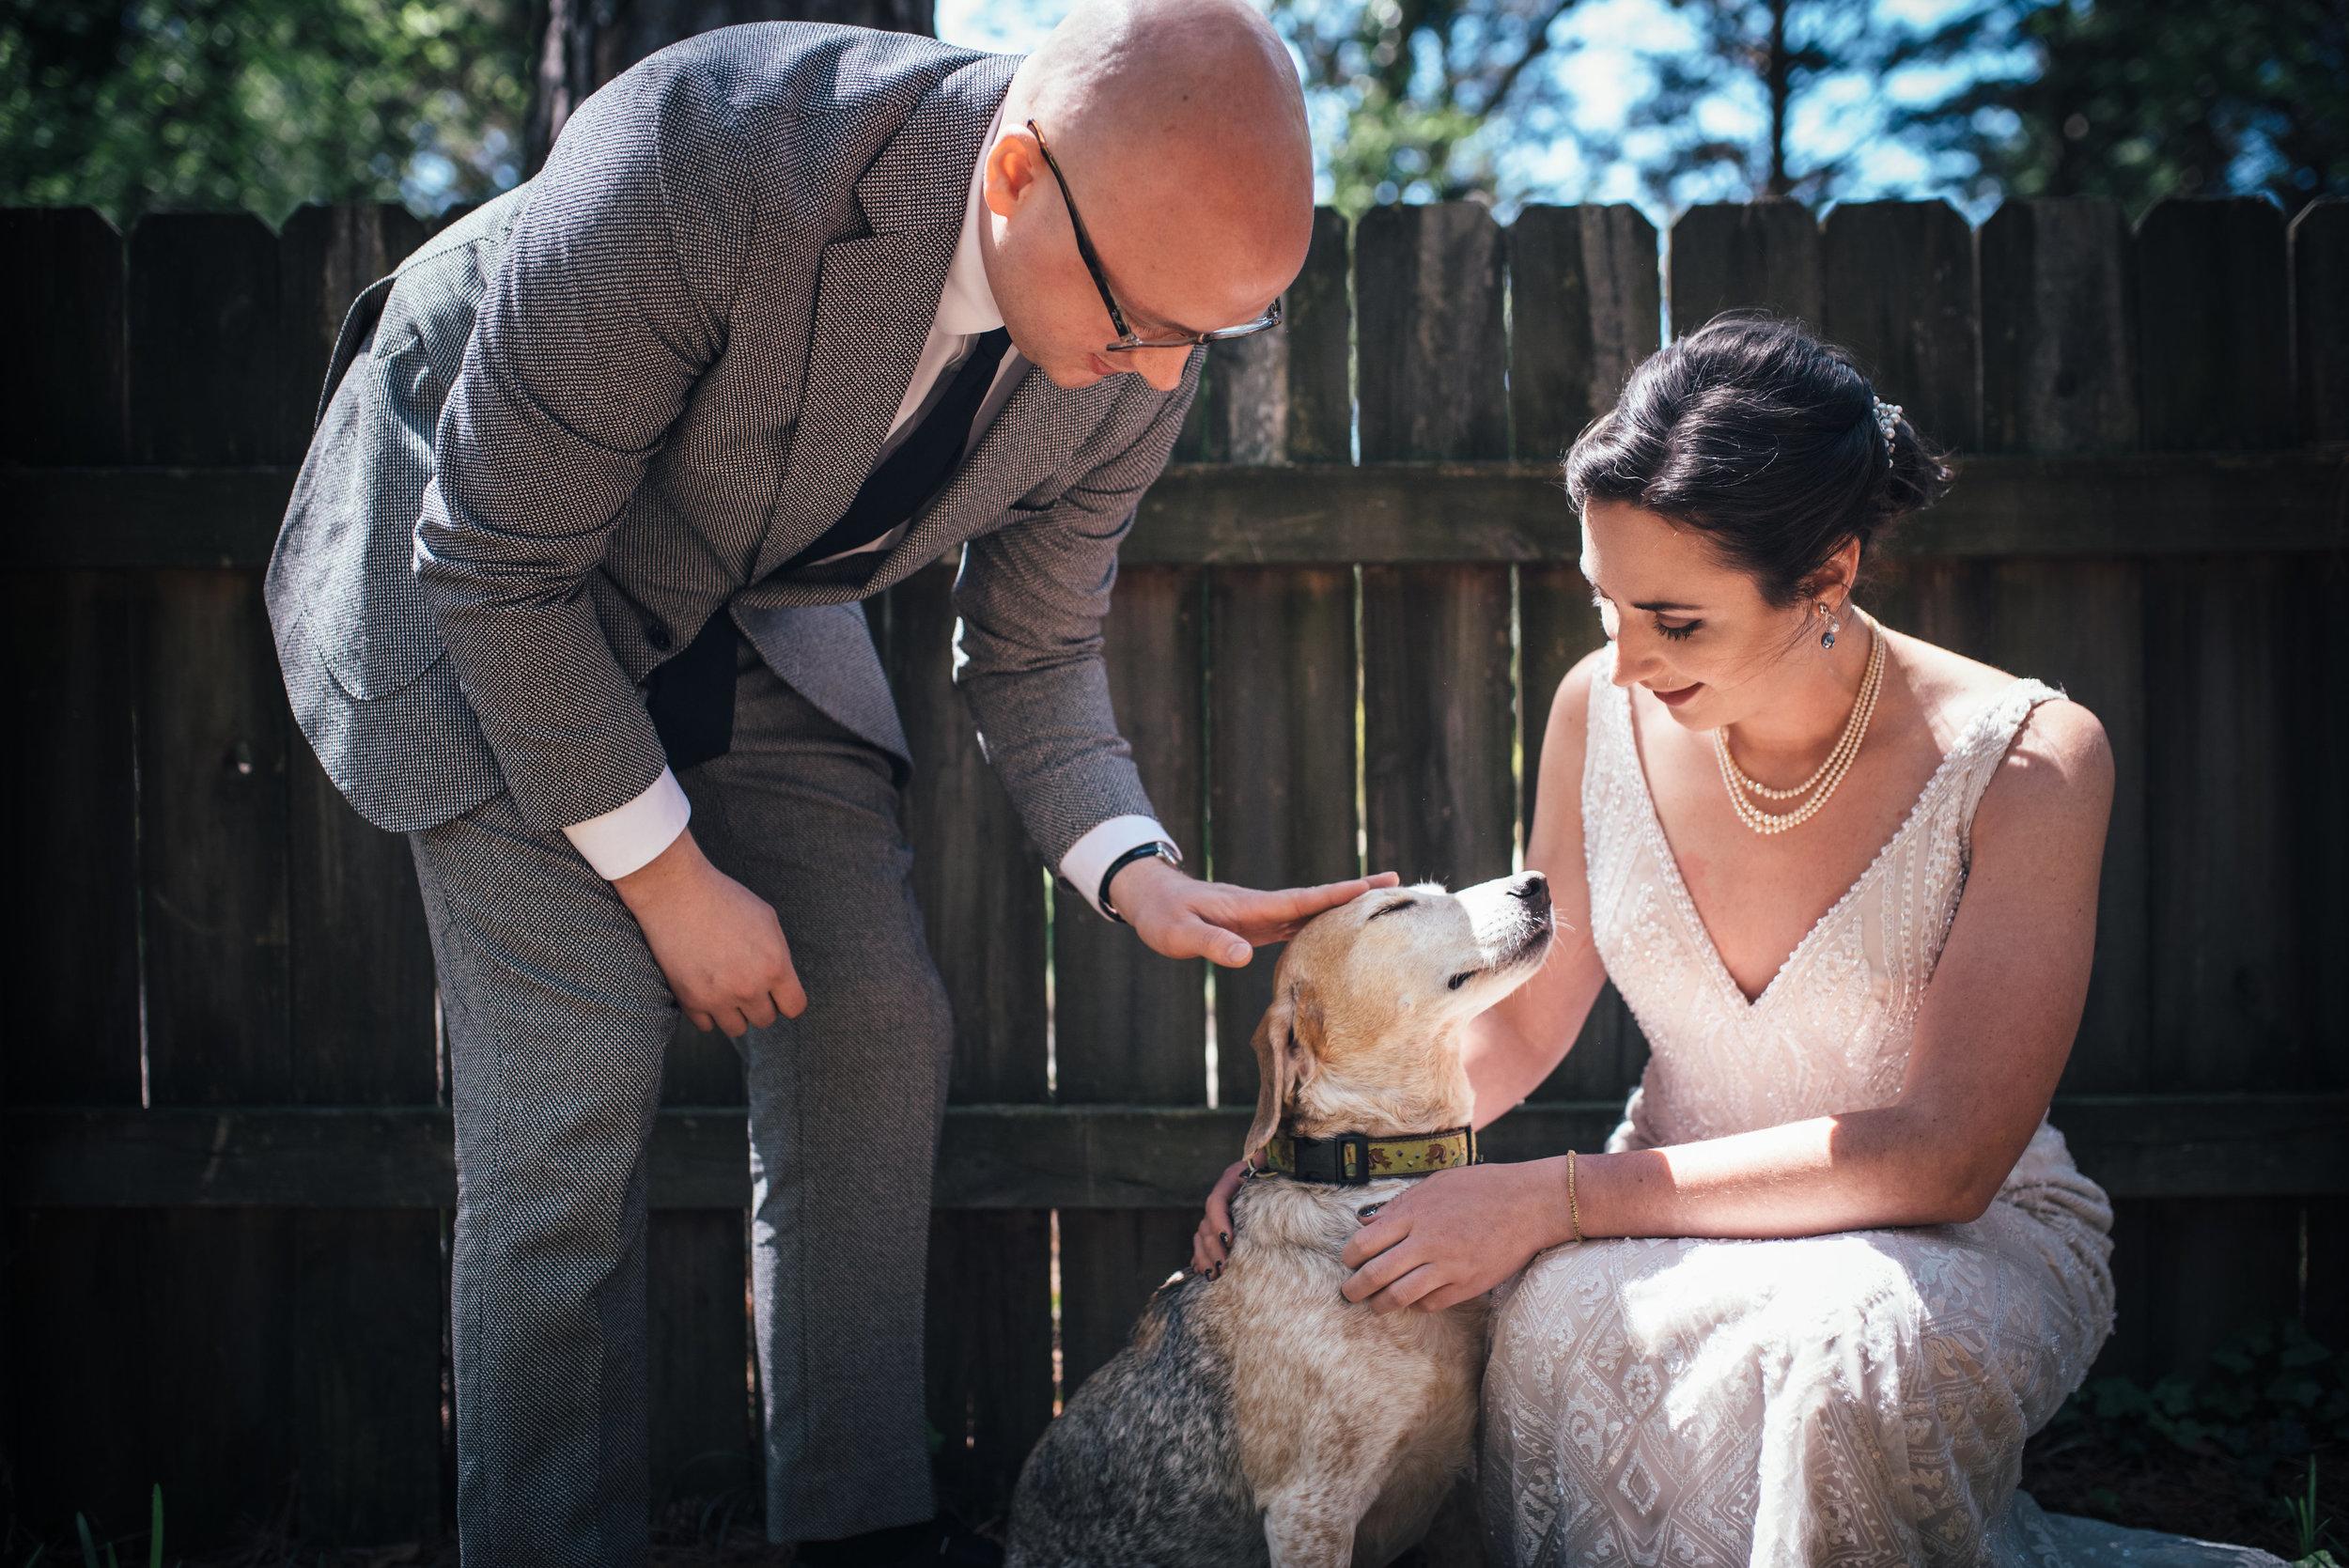 north carolina wedding photographer - downtown raleigh wedding - imurj wedding